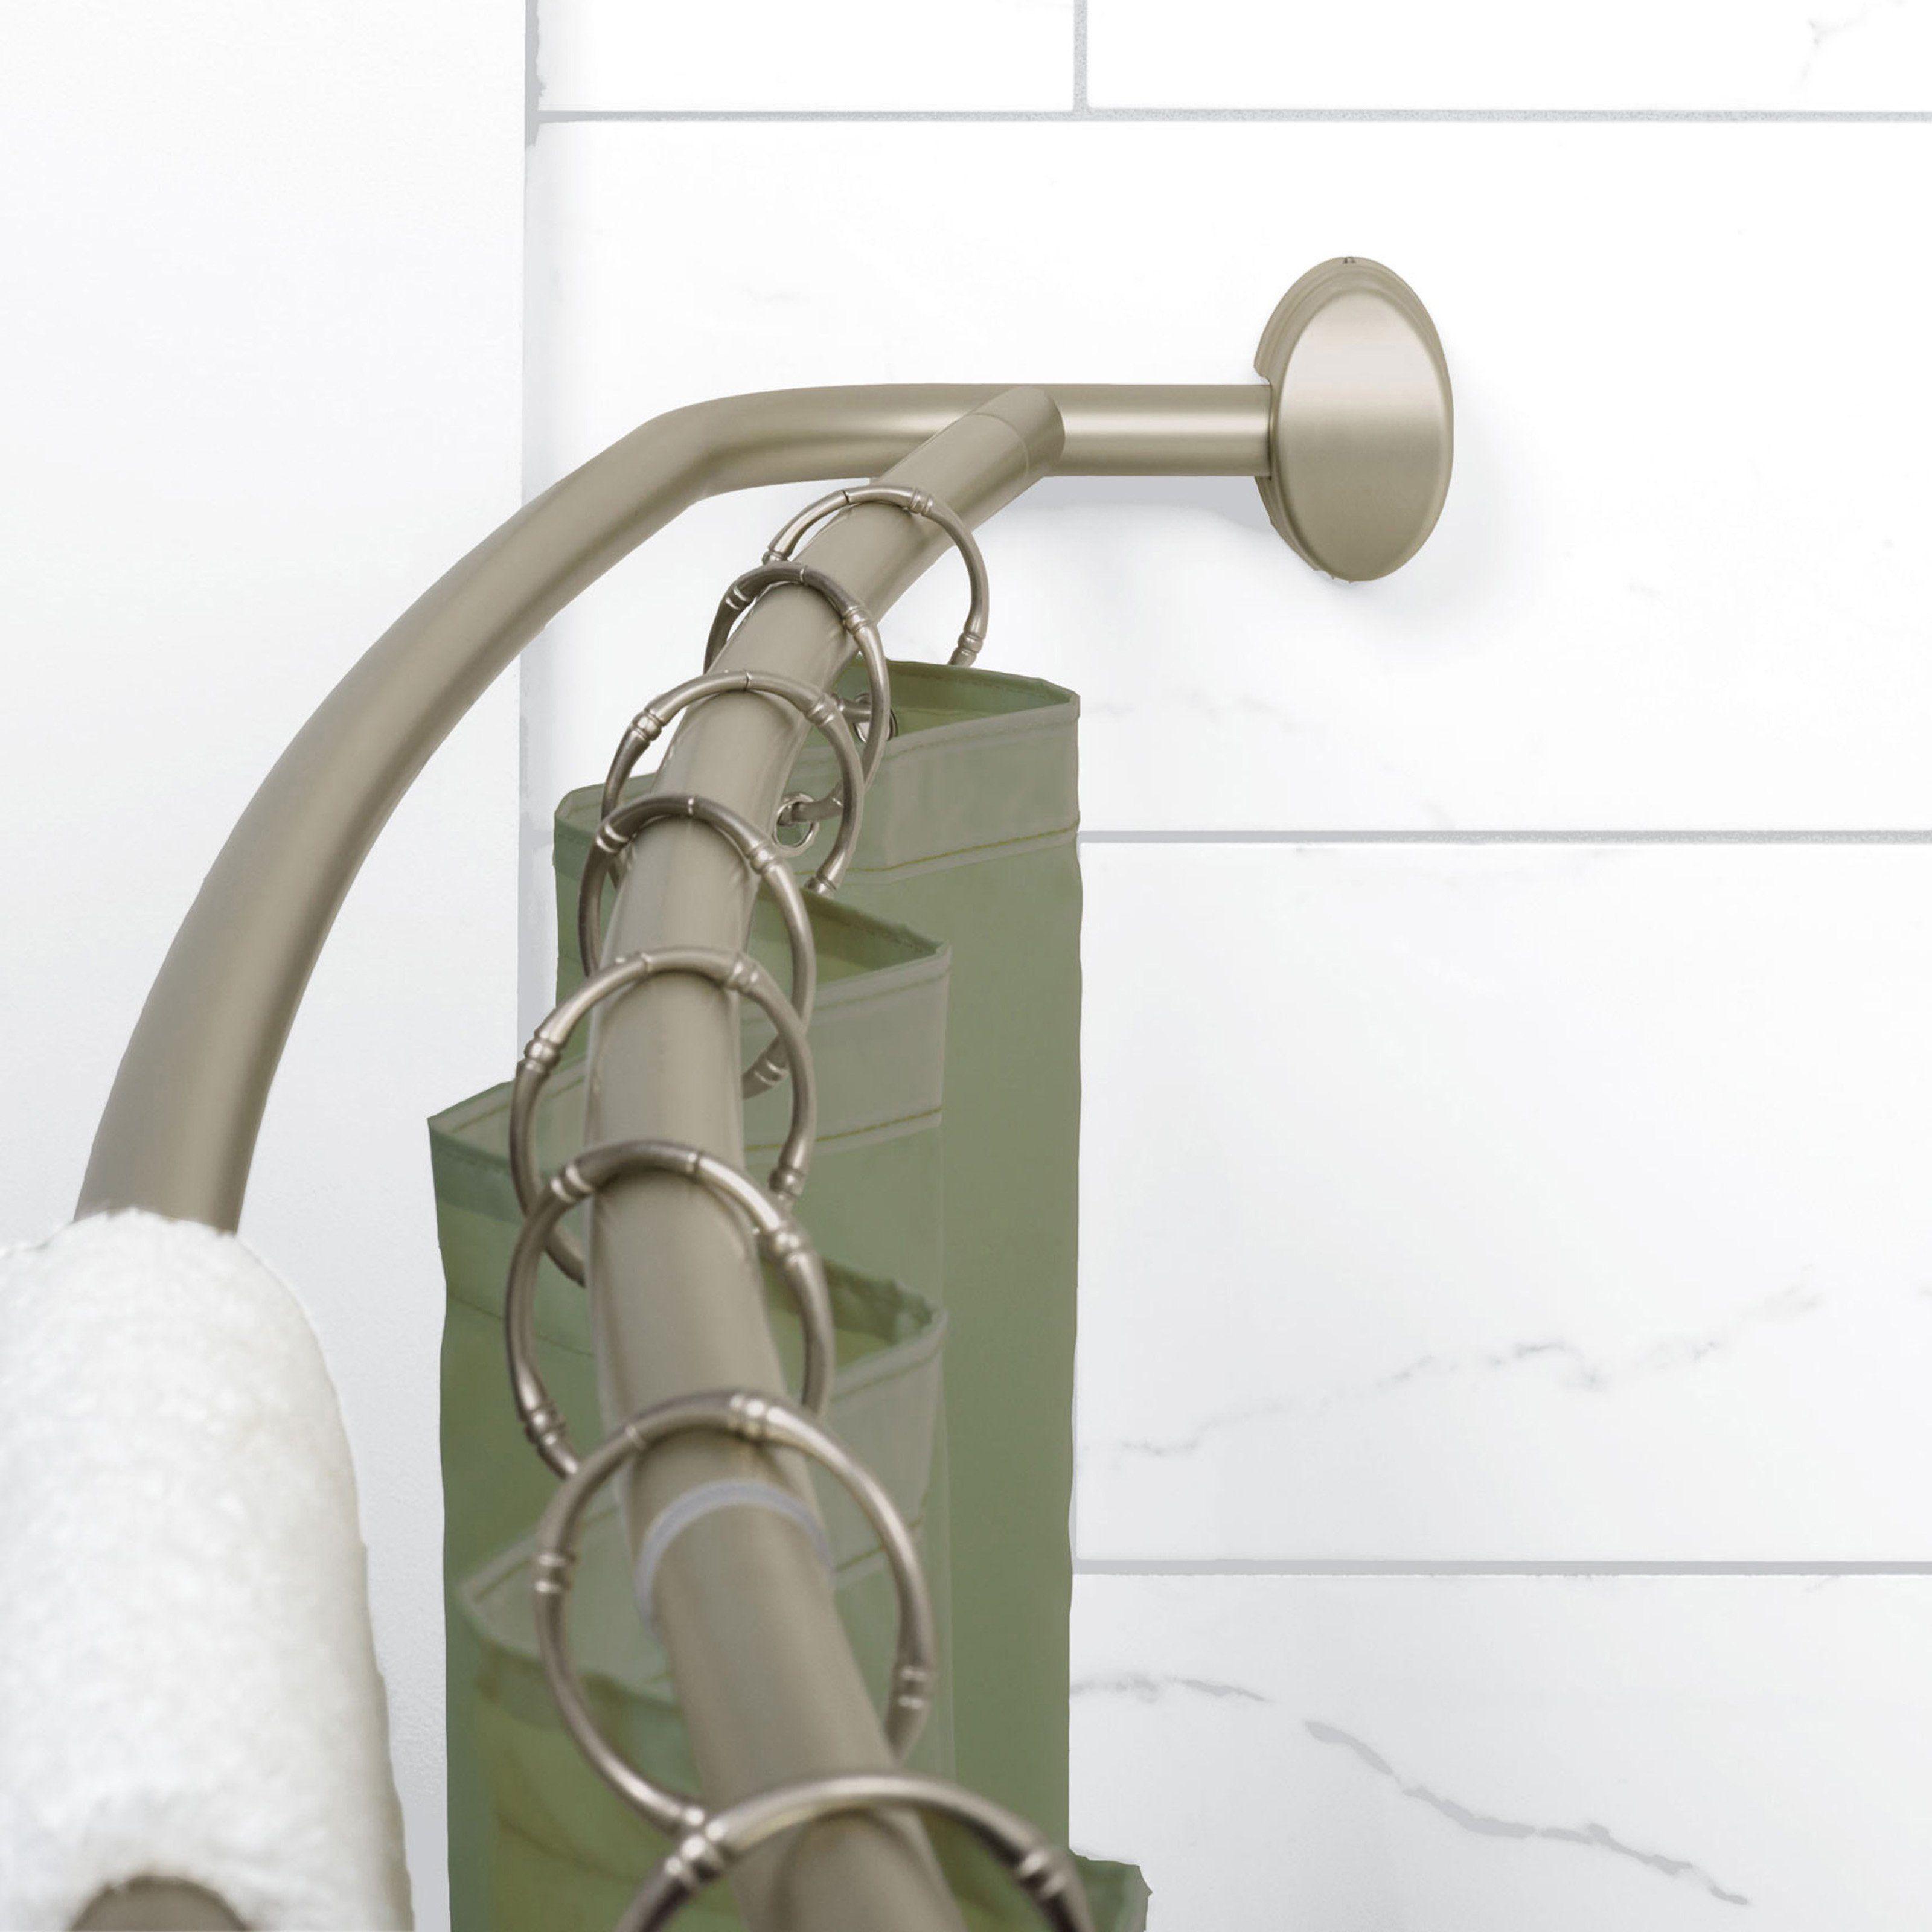 Zenith E35604bn Double Curved Shower Rod E35604bn01 Shower Rod